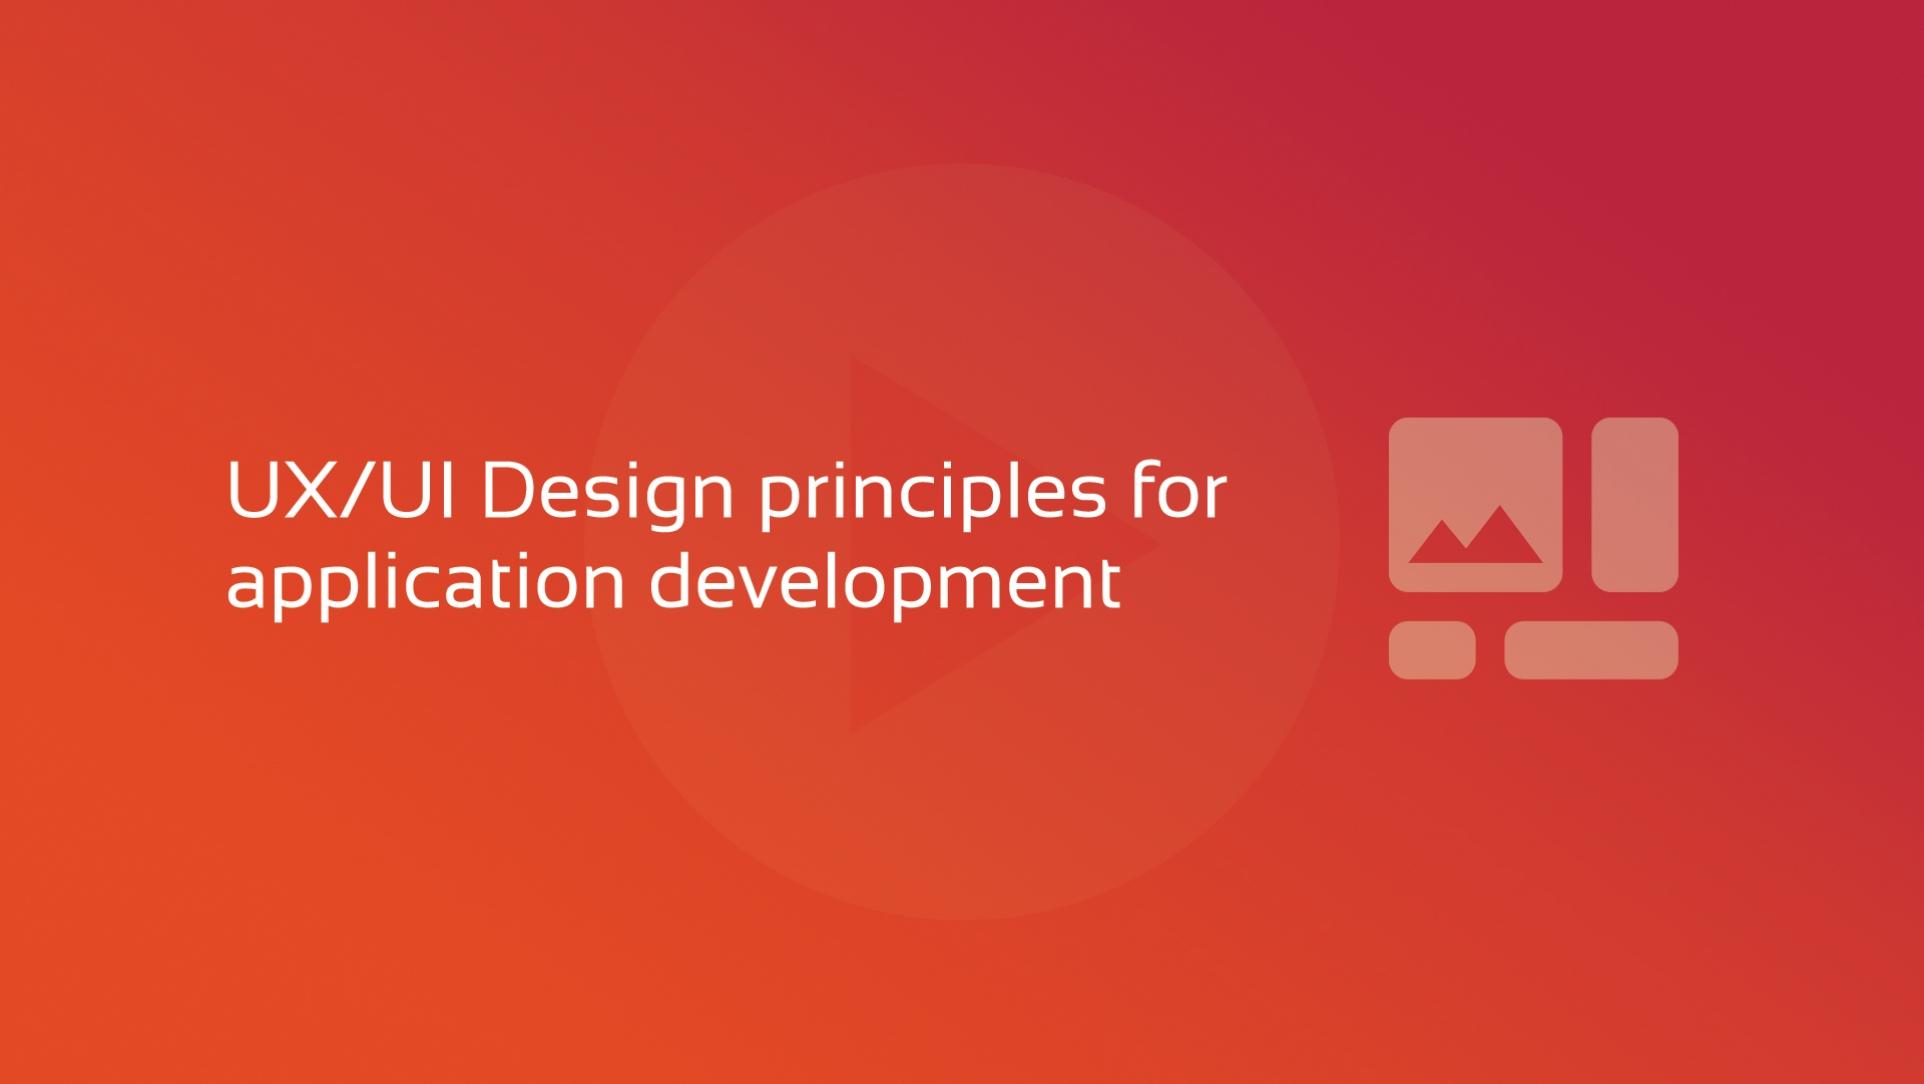 2019-10-04 DFLC UX UI Design principles for application development